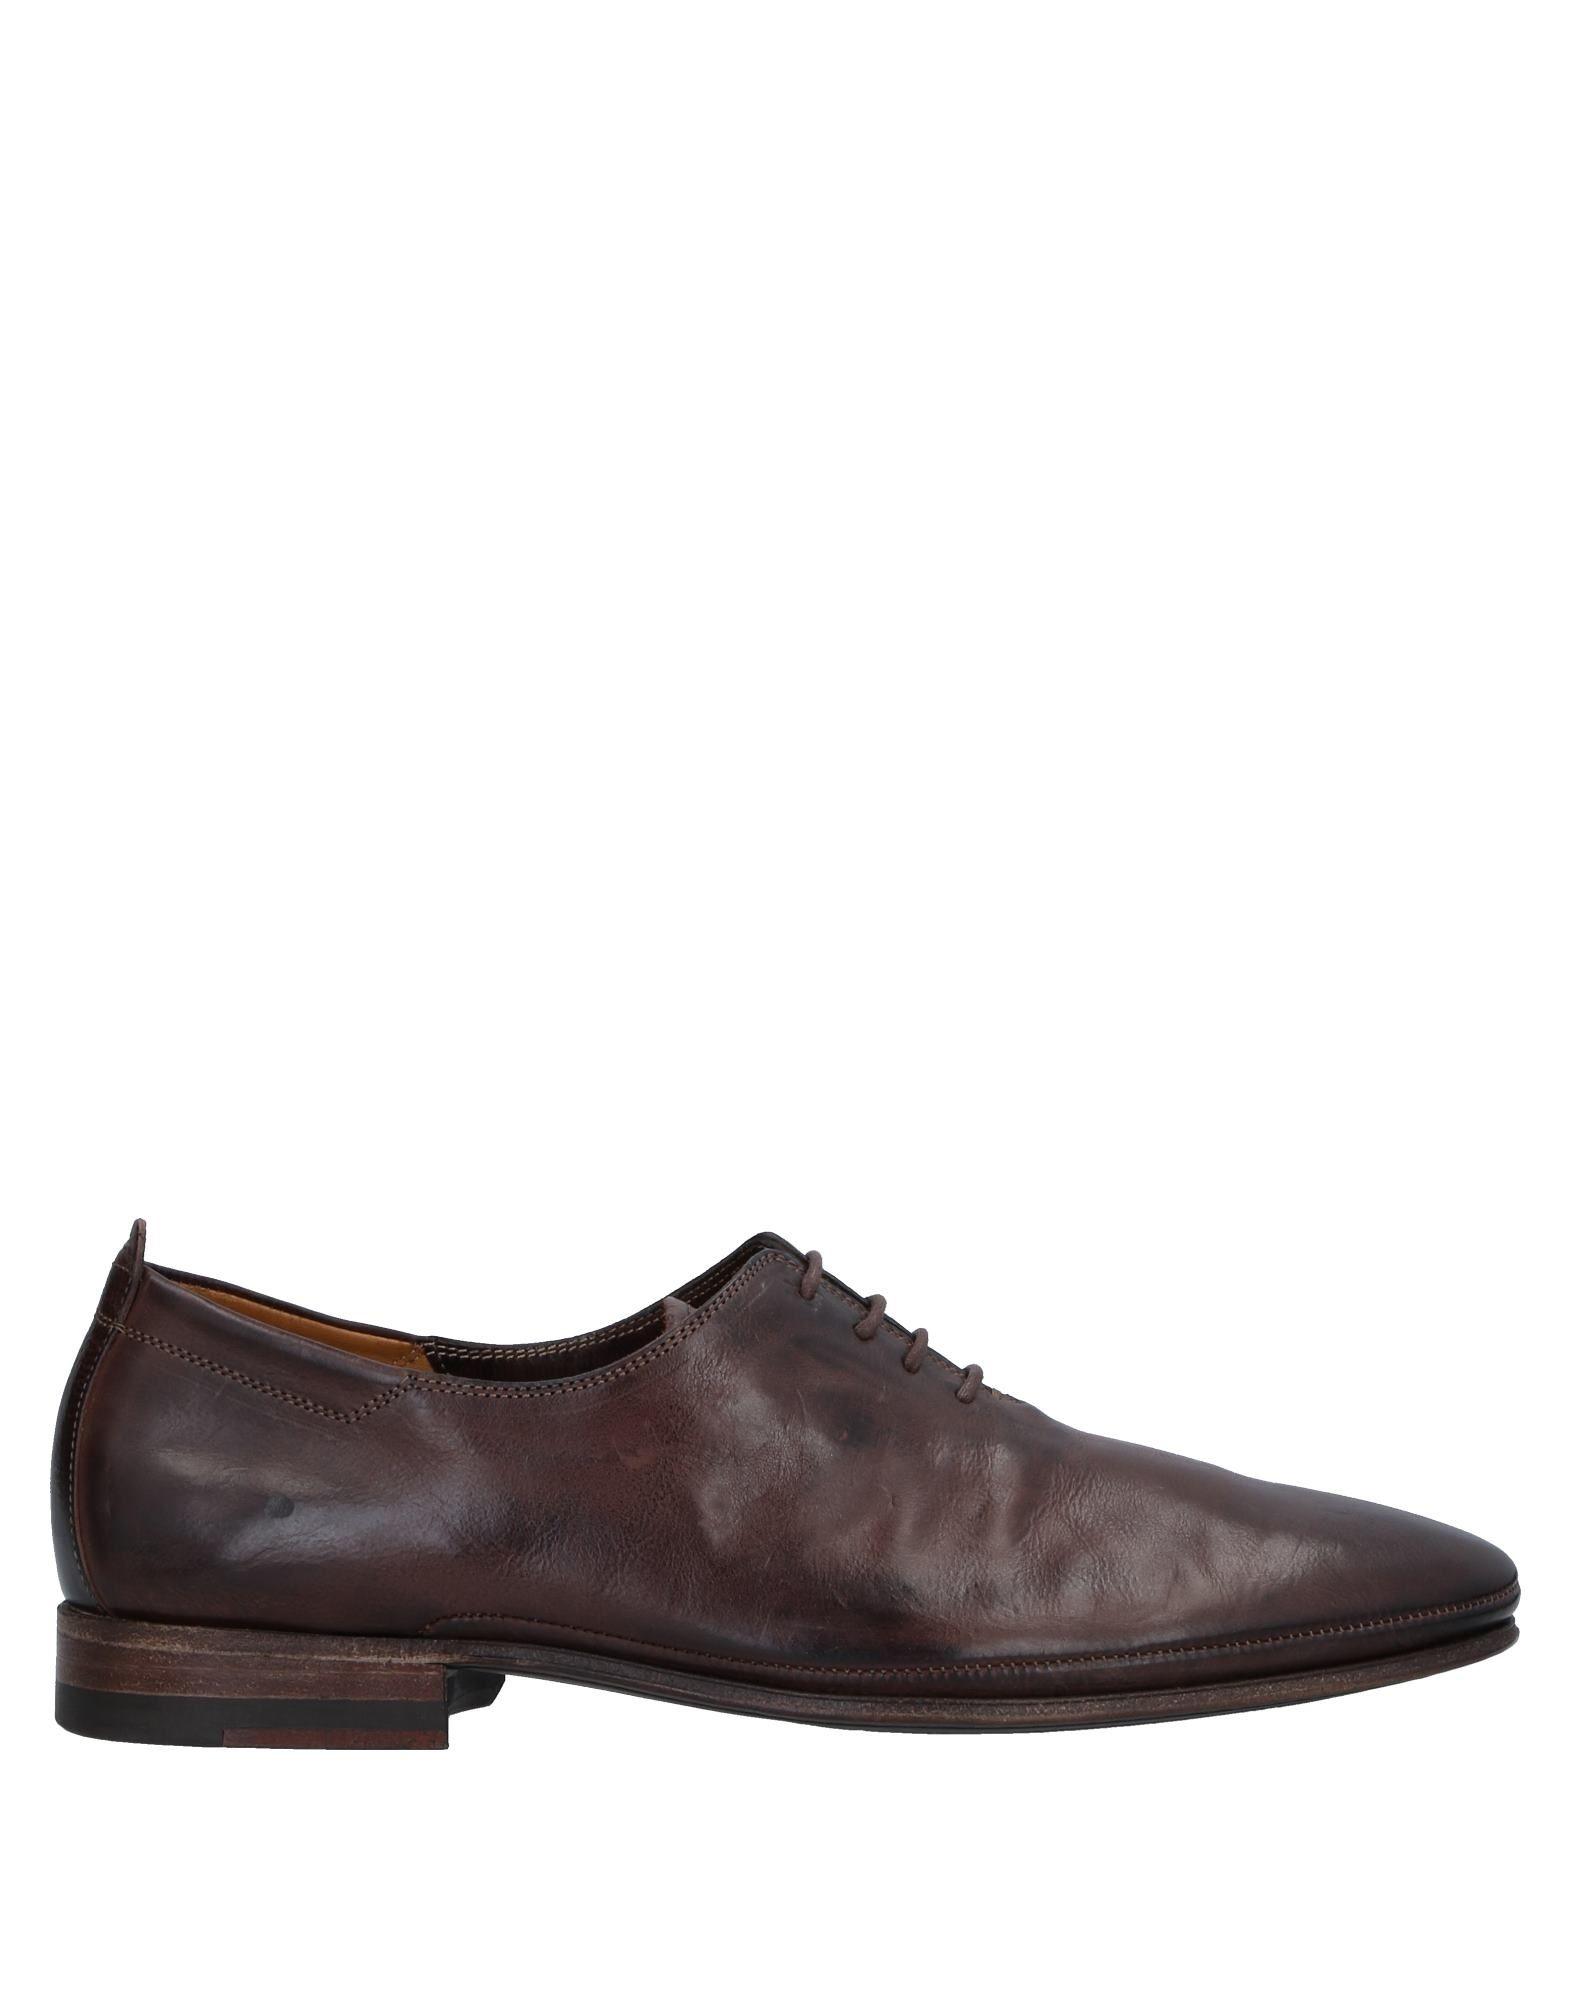 N.D.C. Made By Hand Schnürschuhe Herren  11526057TB Gute Qualität beliebte Schuhe